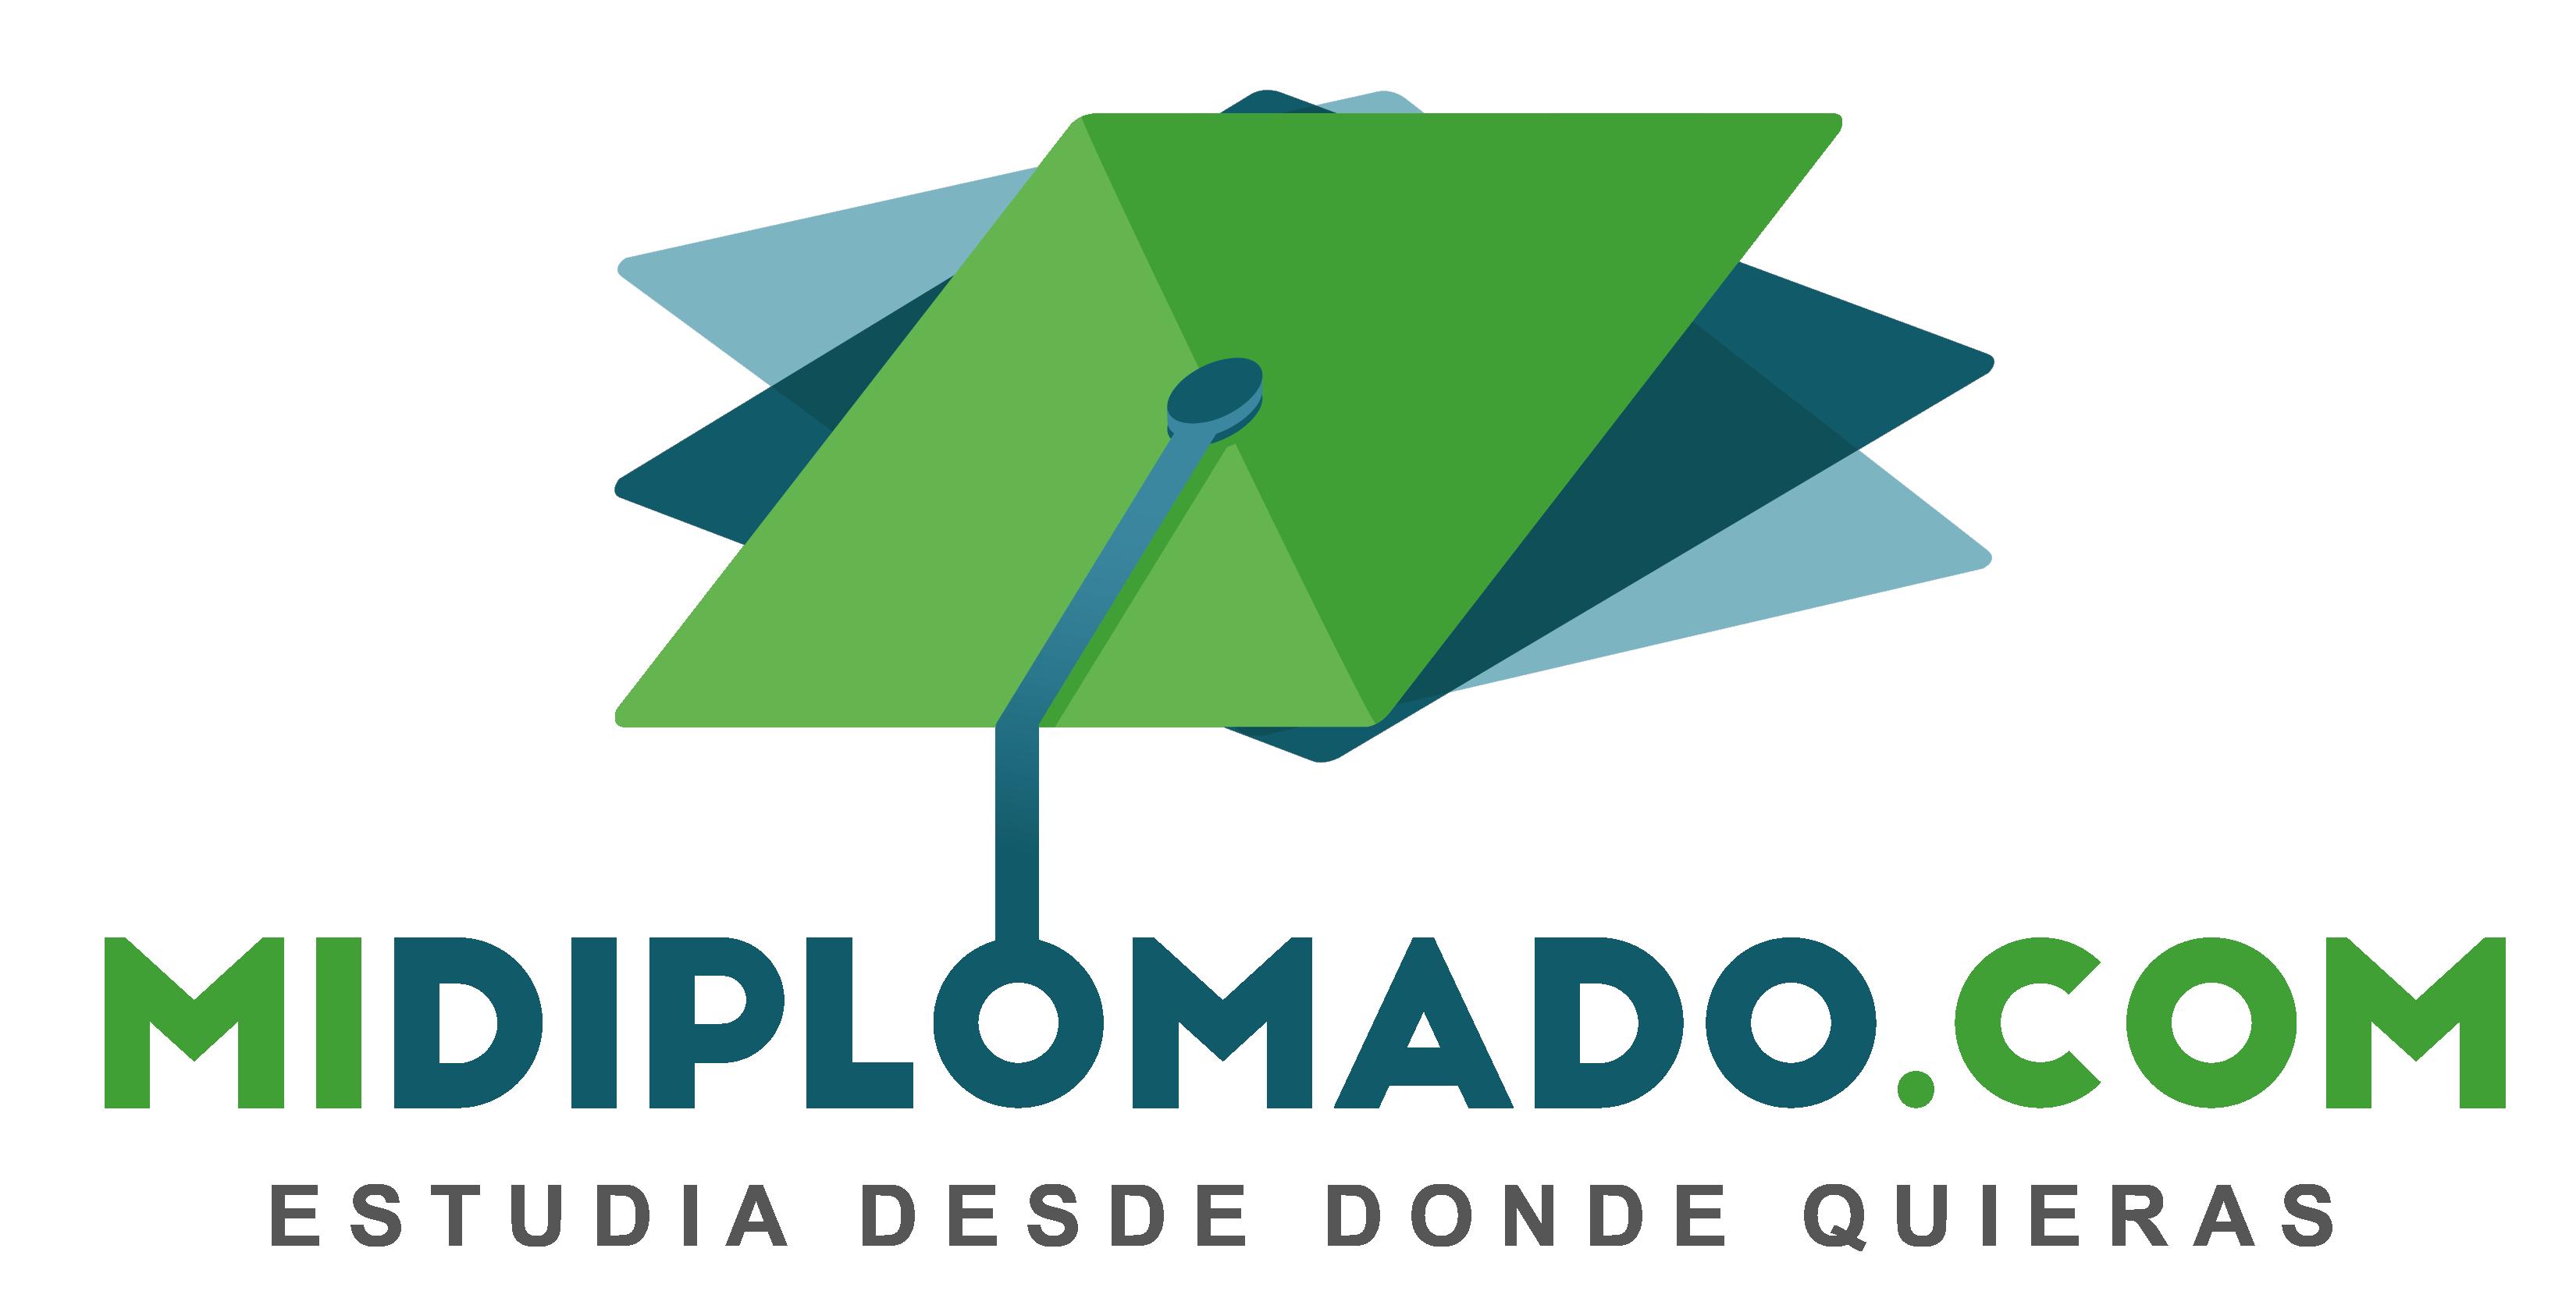 MiDiplomado.com